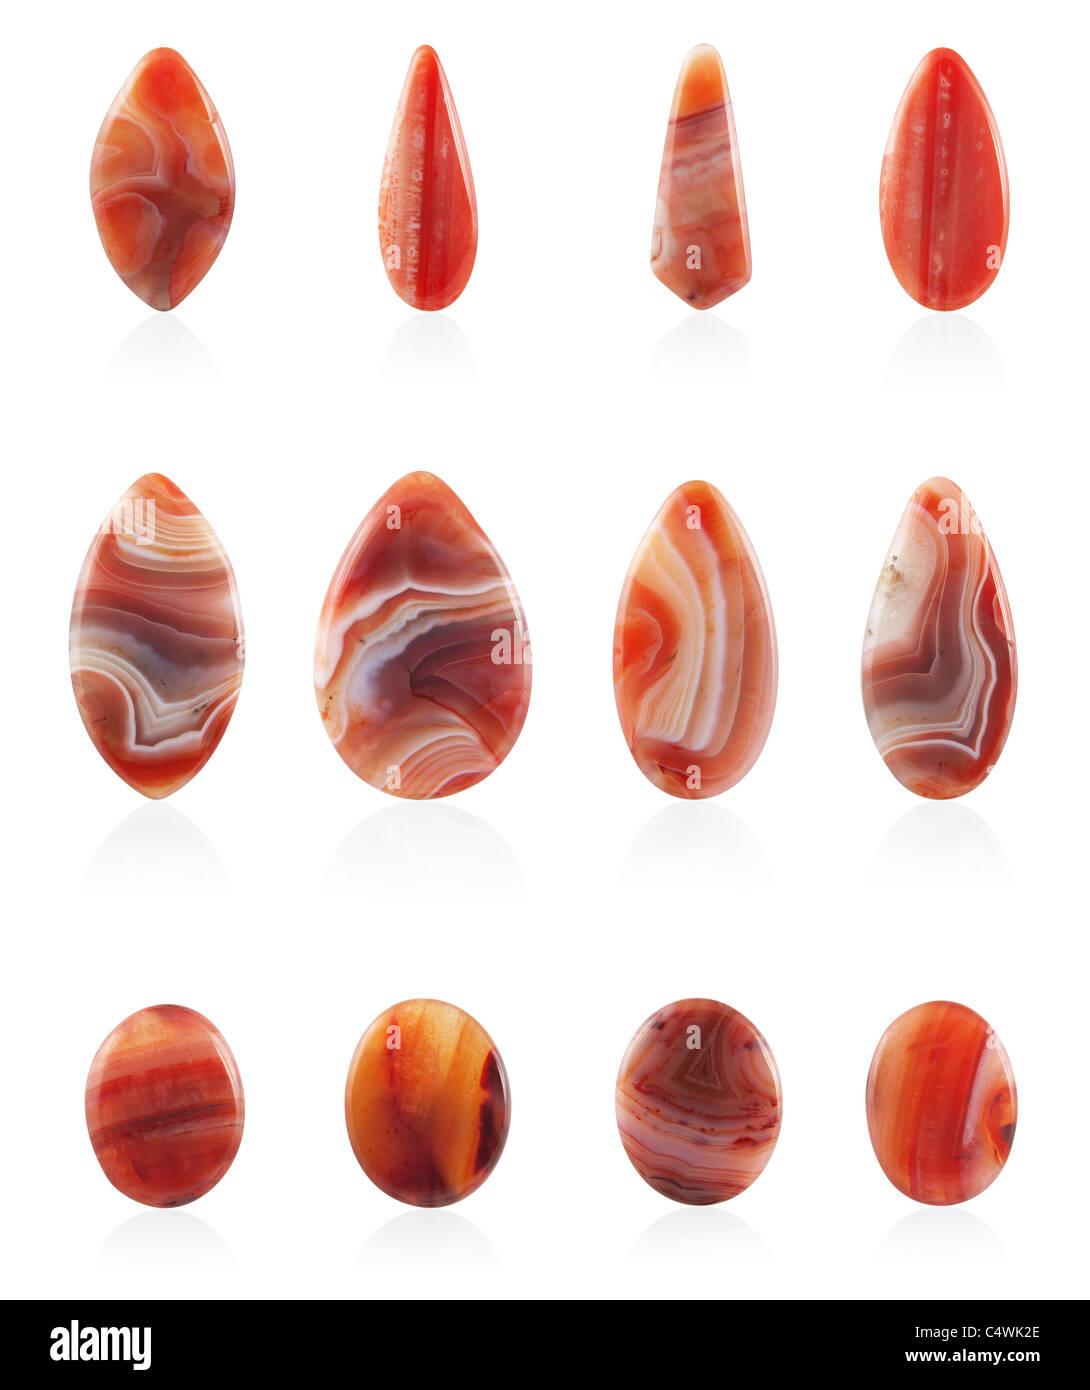 Carnelian stones on white background - Stock Image